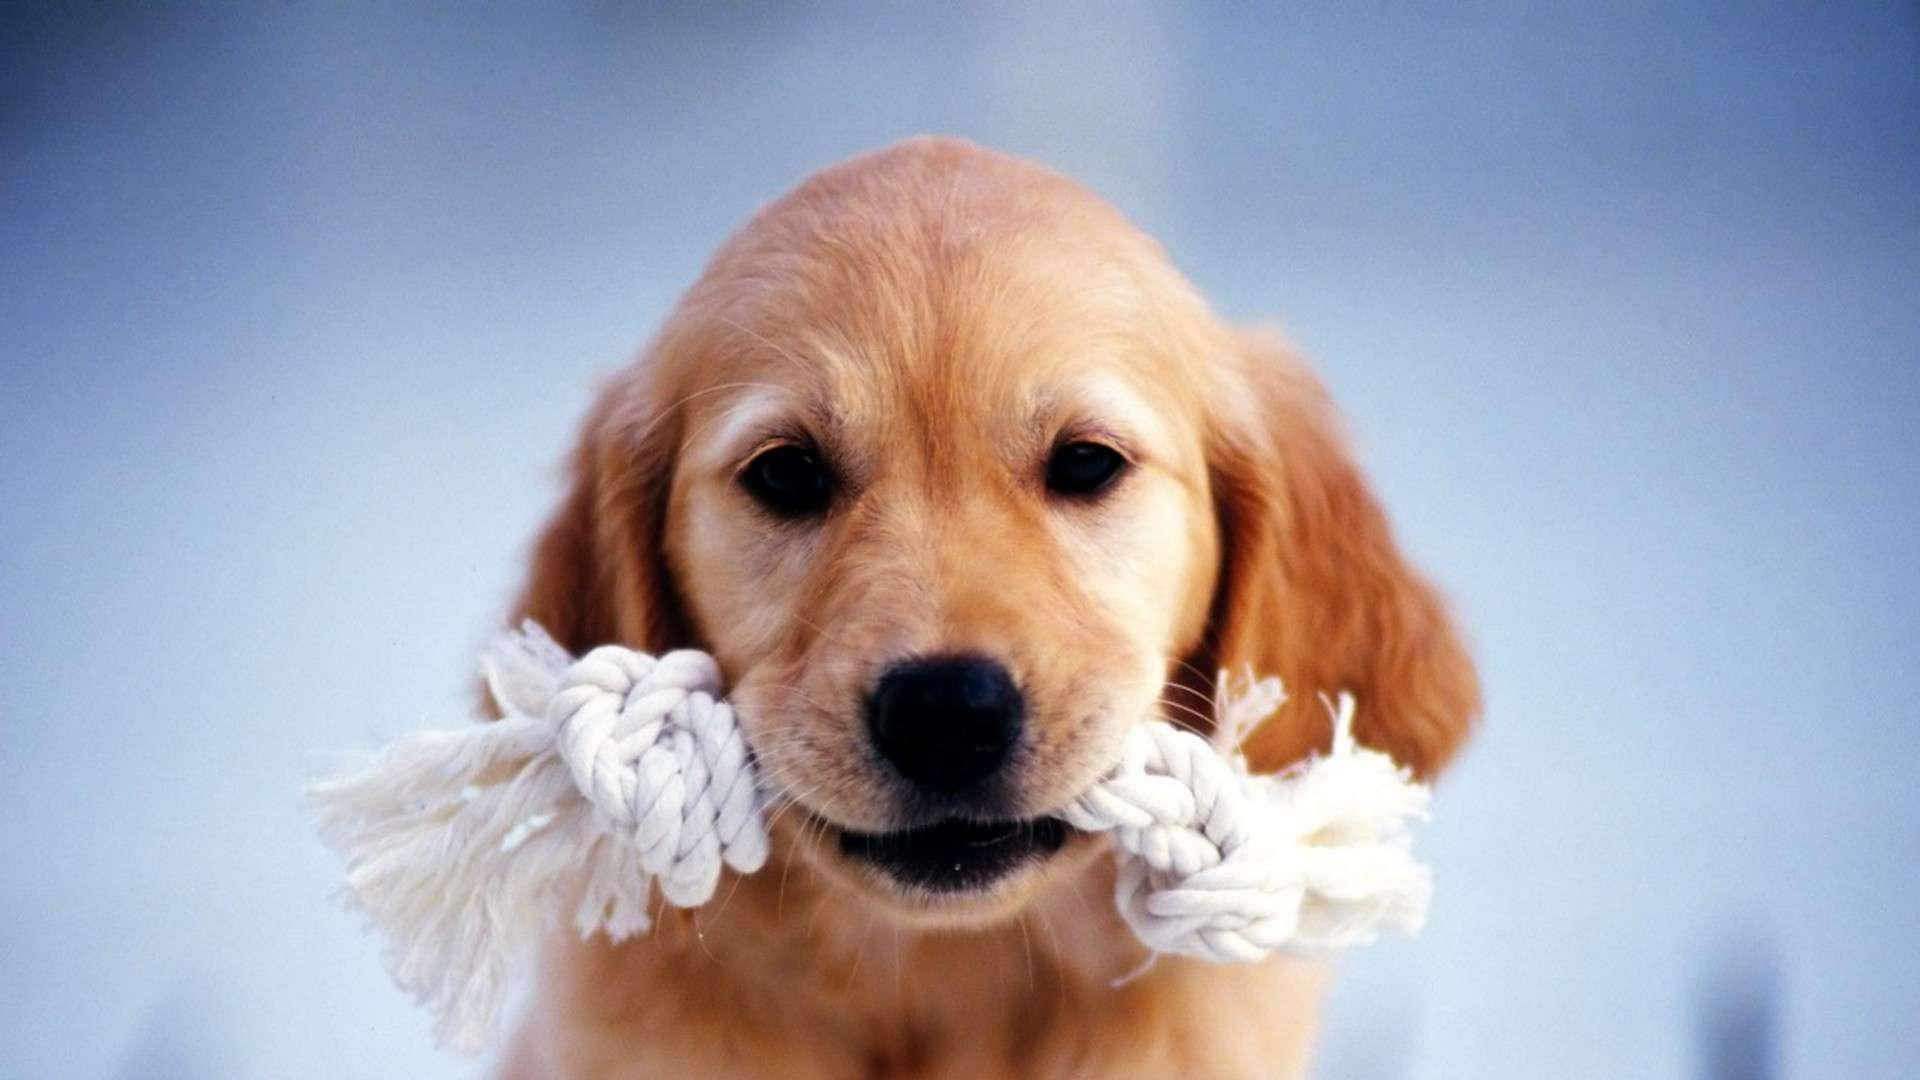 Cute HD Dachshund Puppies Wallpaper HDWallWidecom 1920x1080